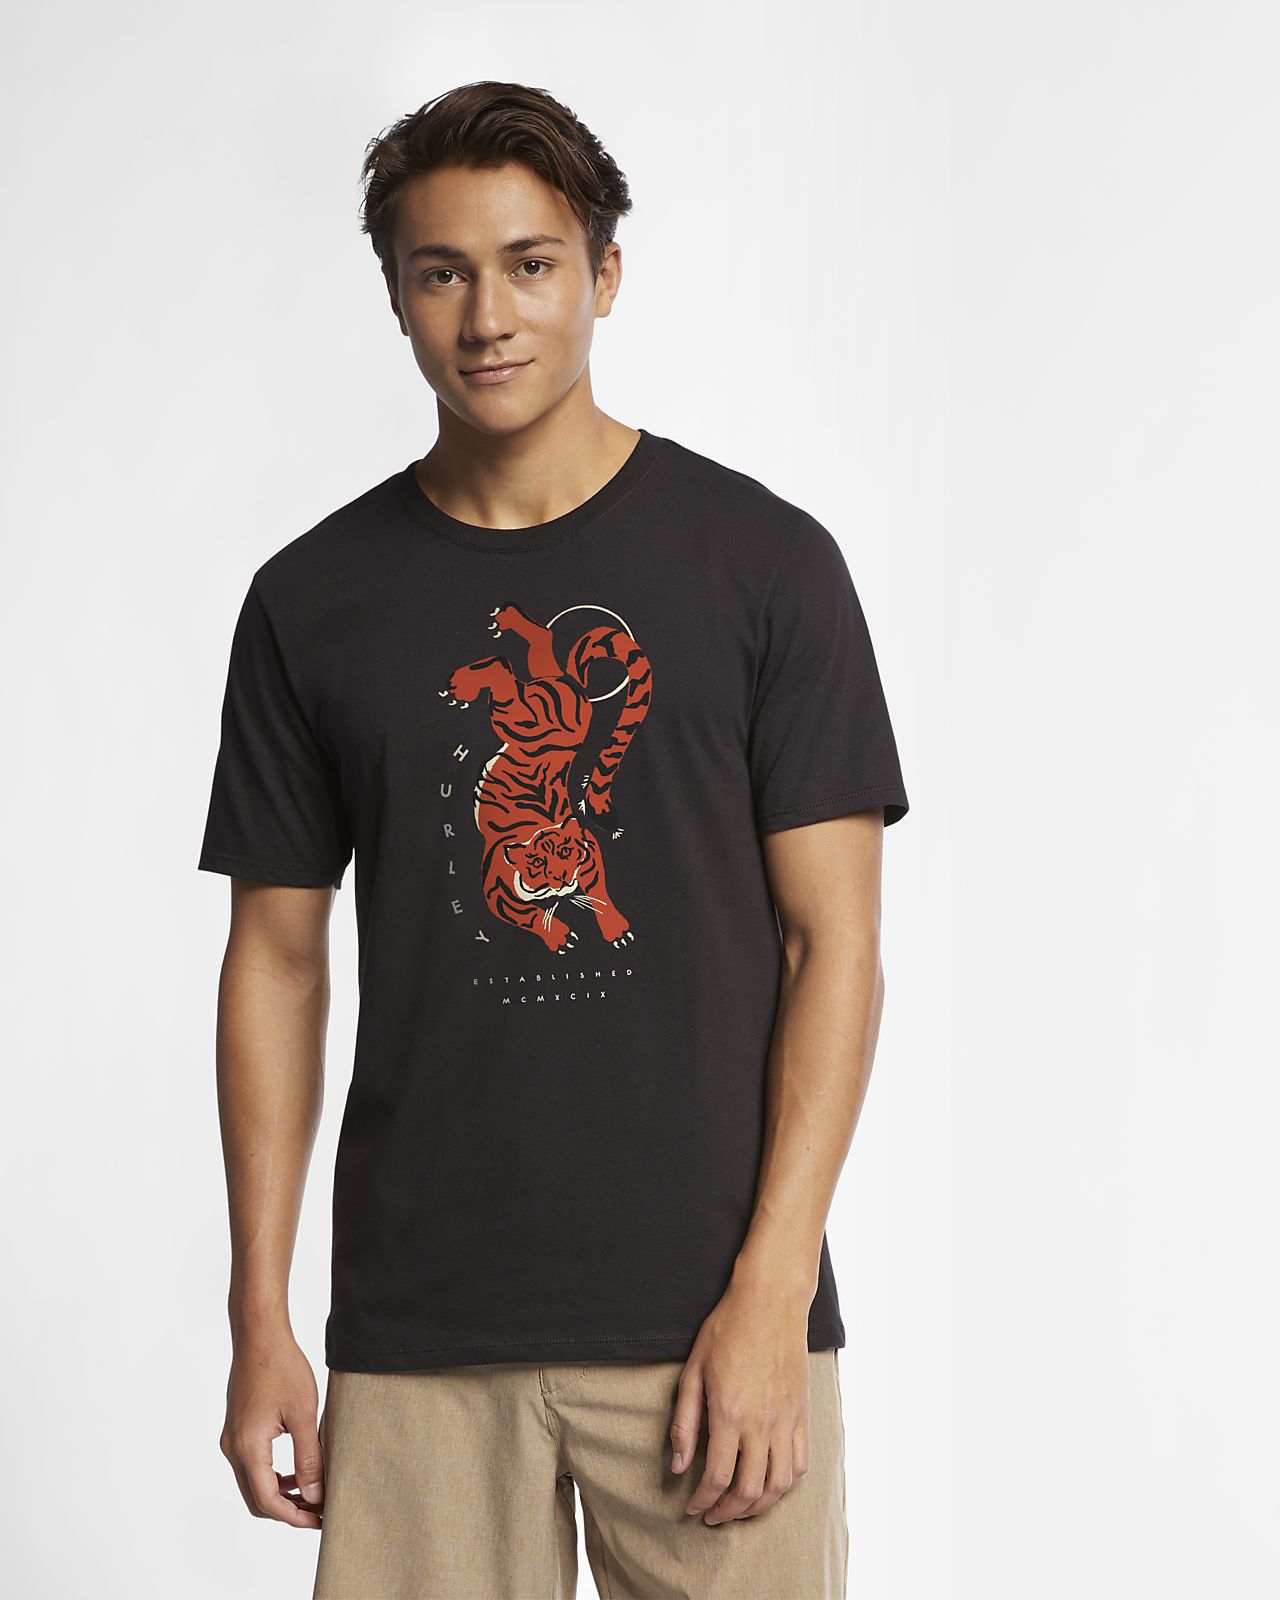 Tee-shirt Hurley Premium Tigre pour Homme